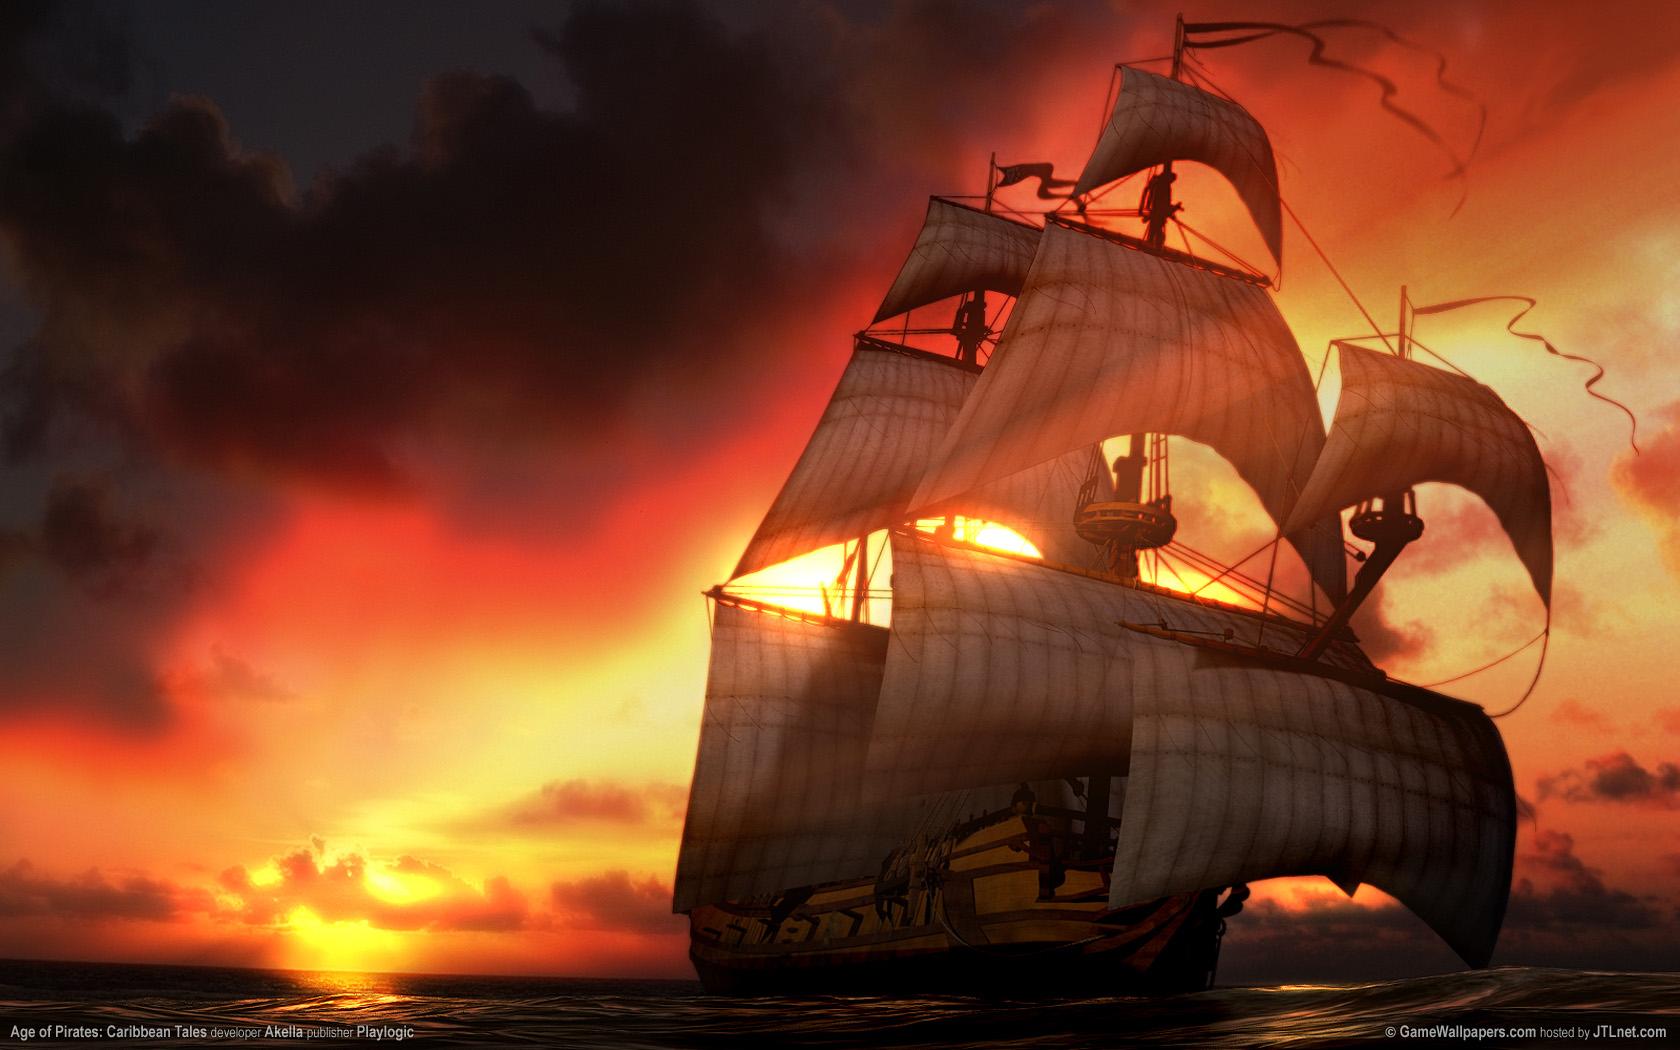 1680x1050 Age of Pirates desktop PC and Mac wallpaper